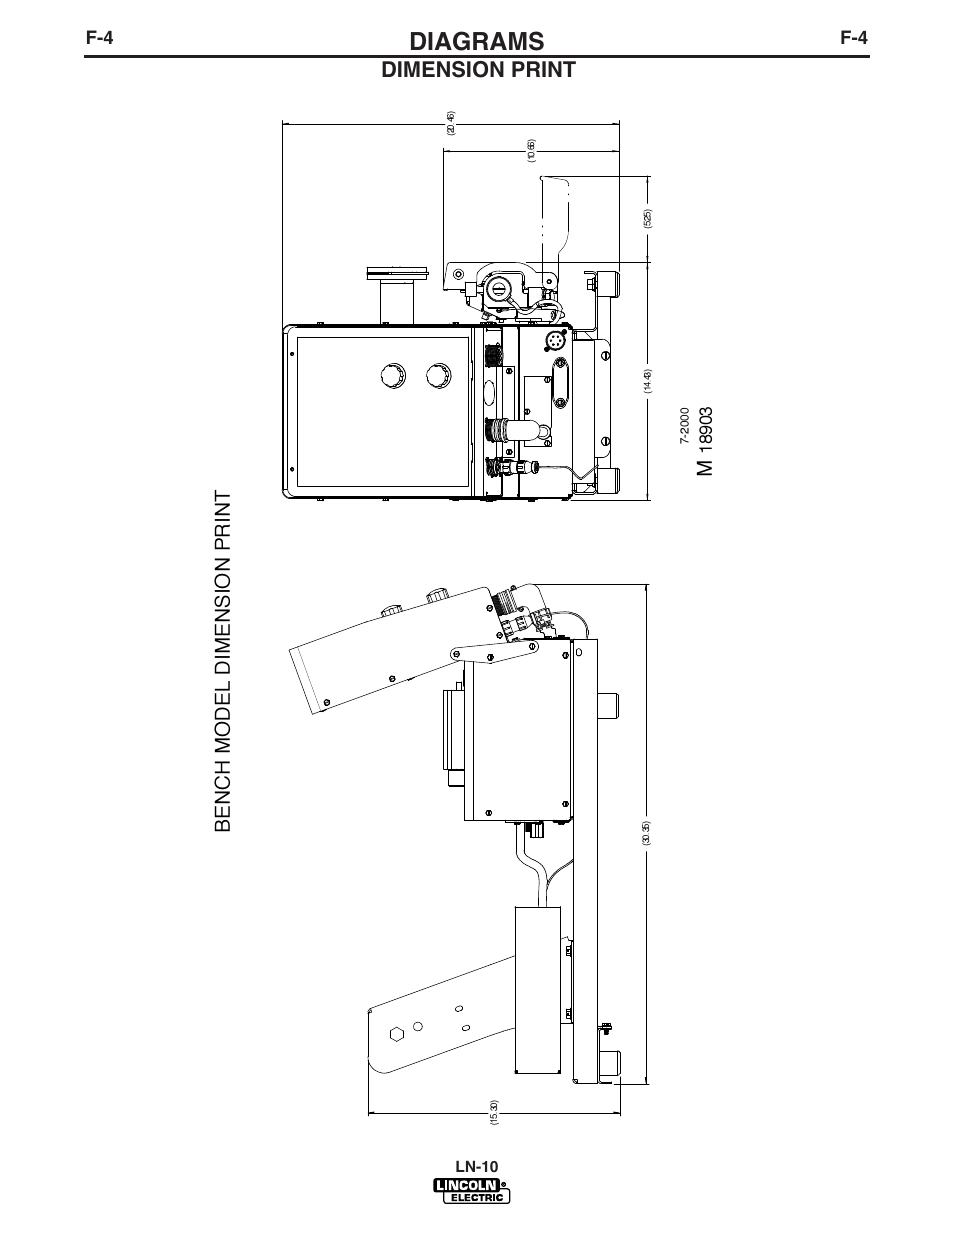 Diagrams, Dimension print, Bench model dimension print